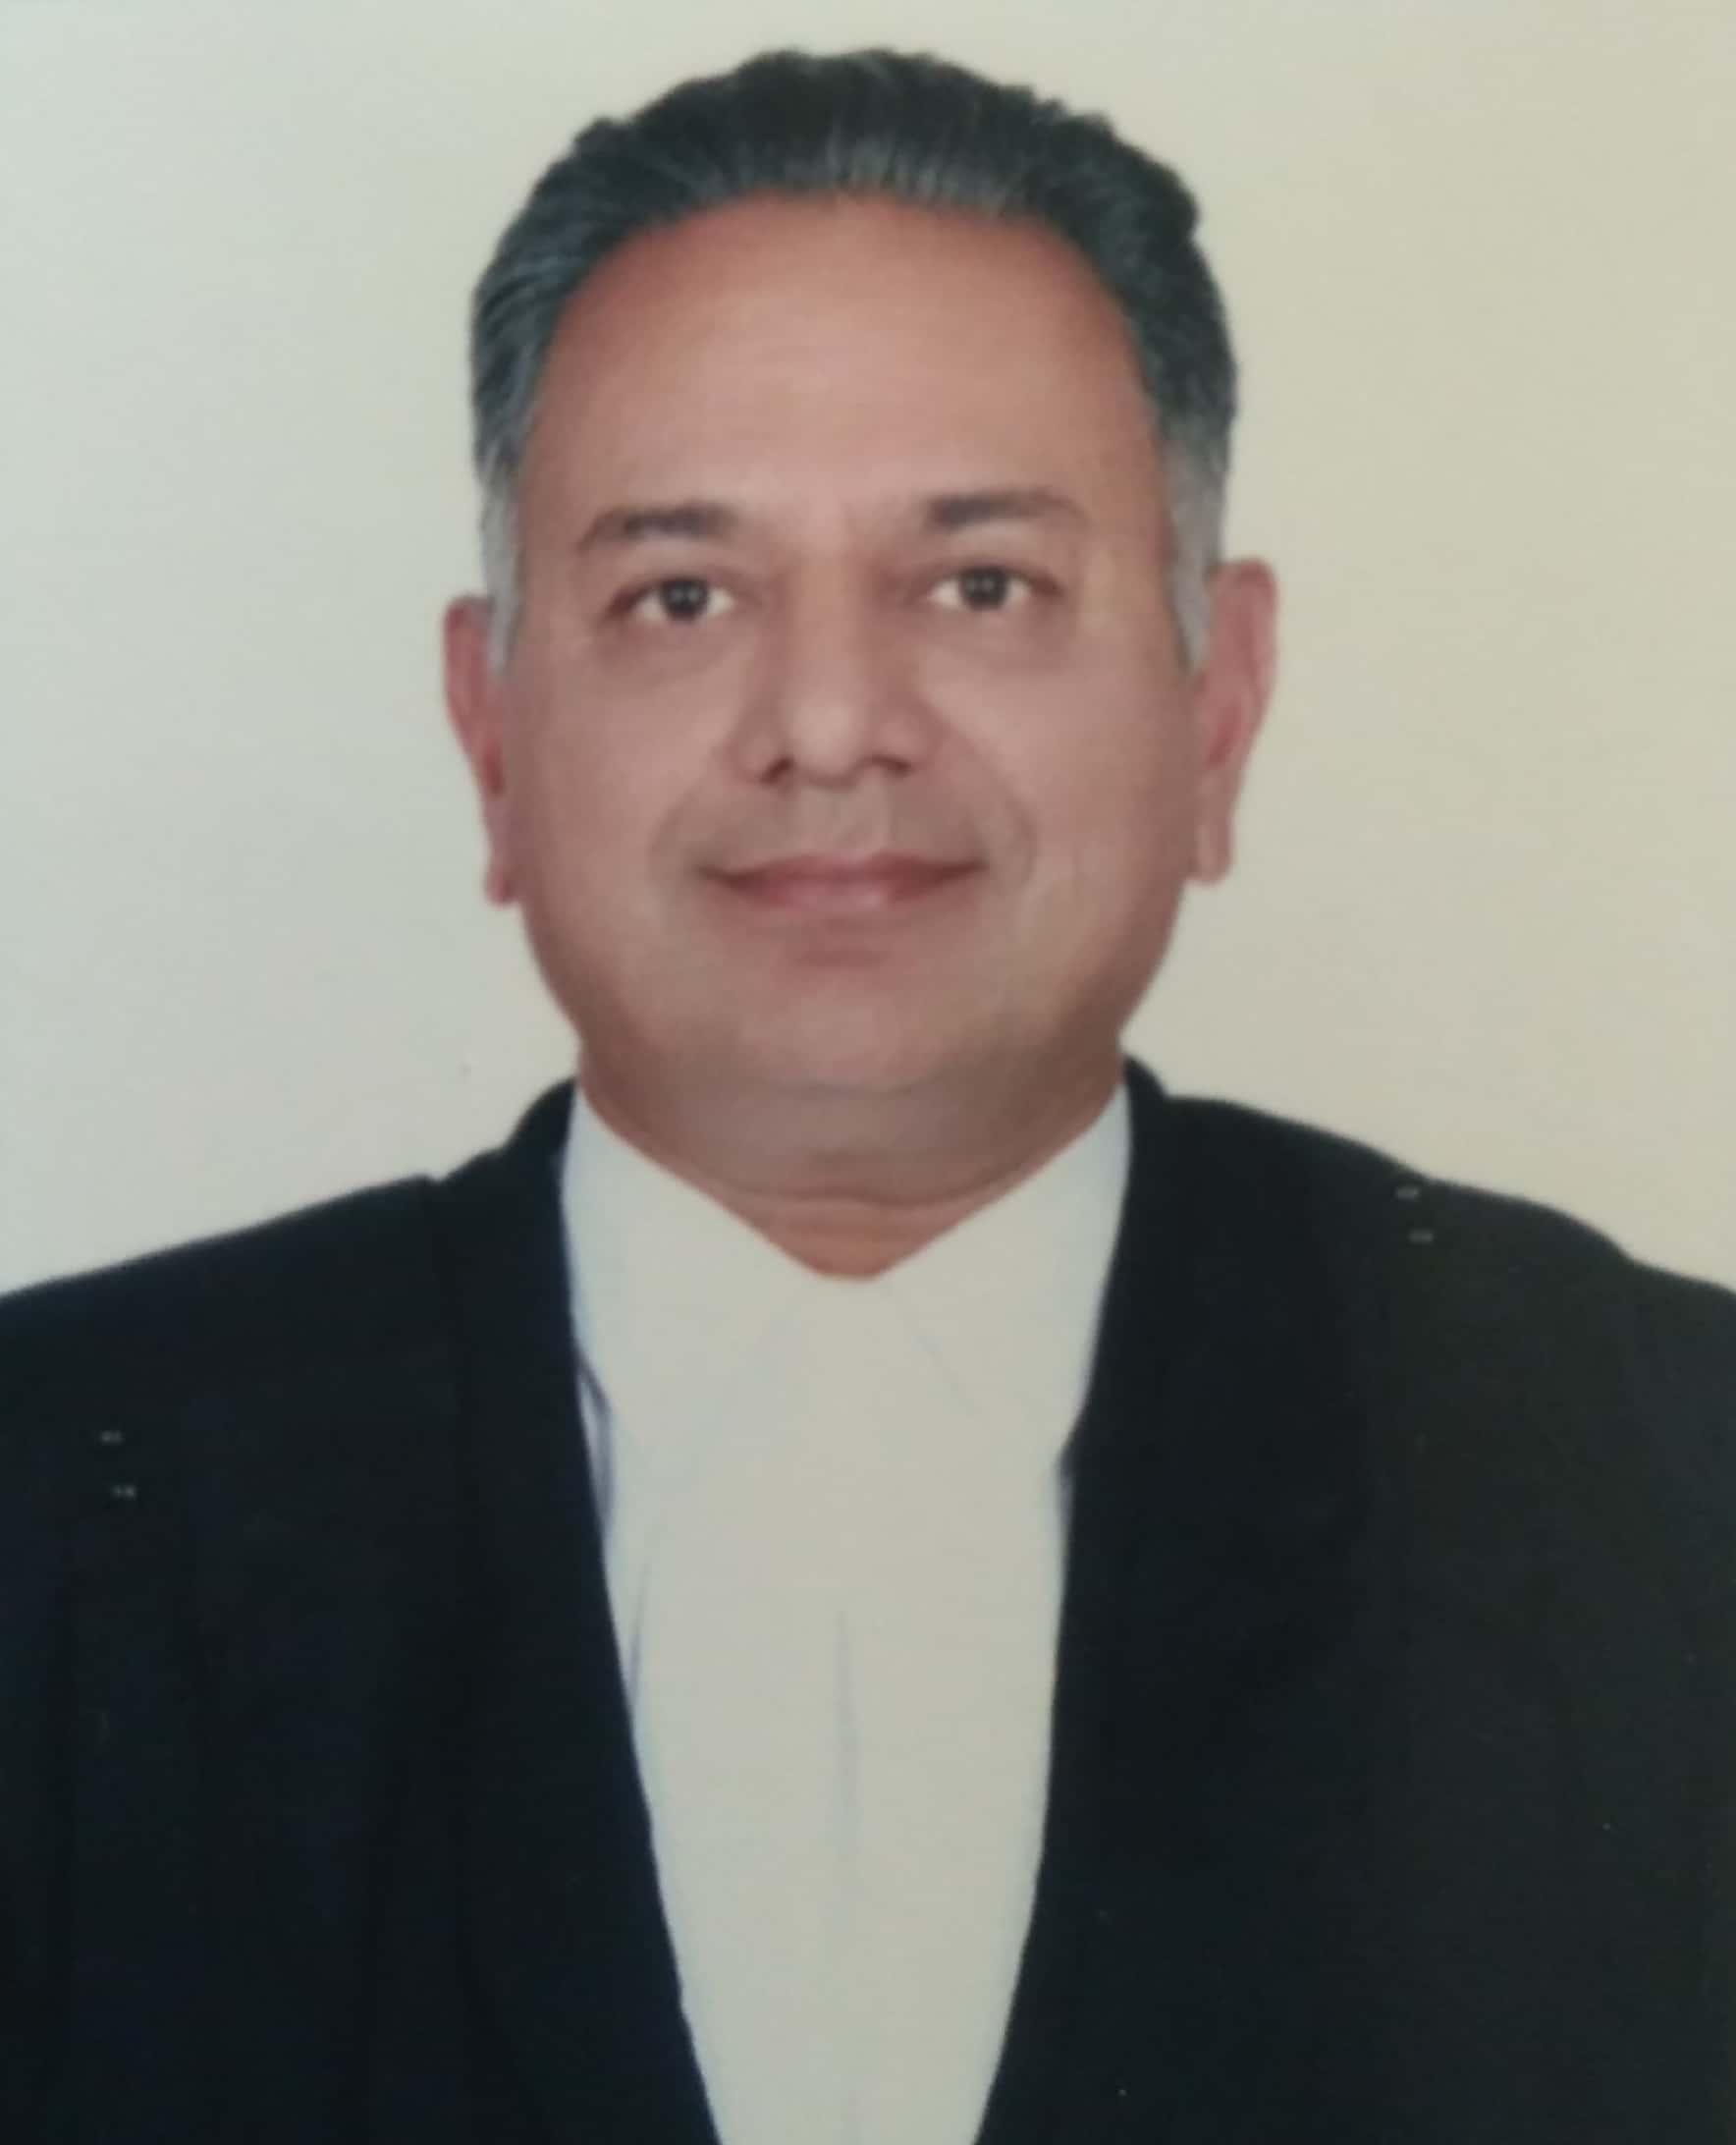 RISHI LAKHANPAL